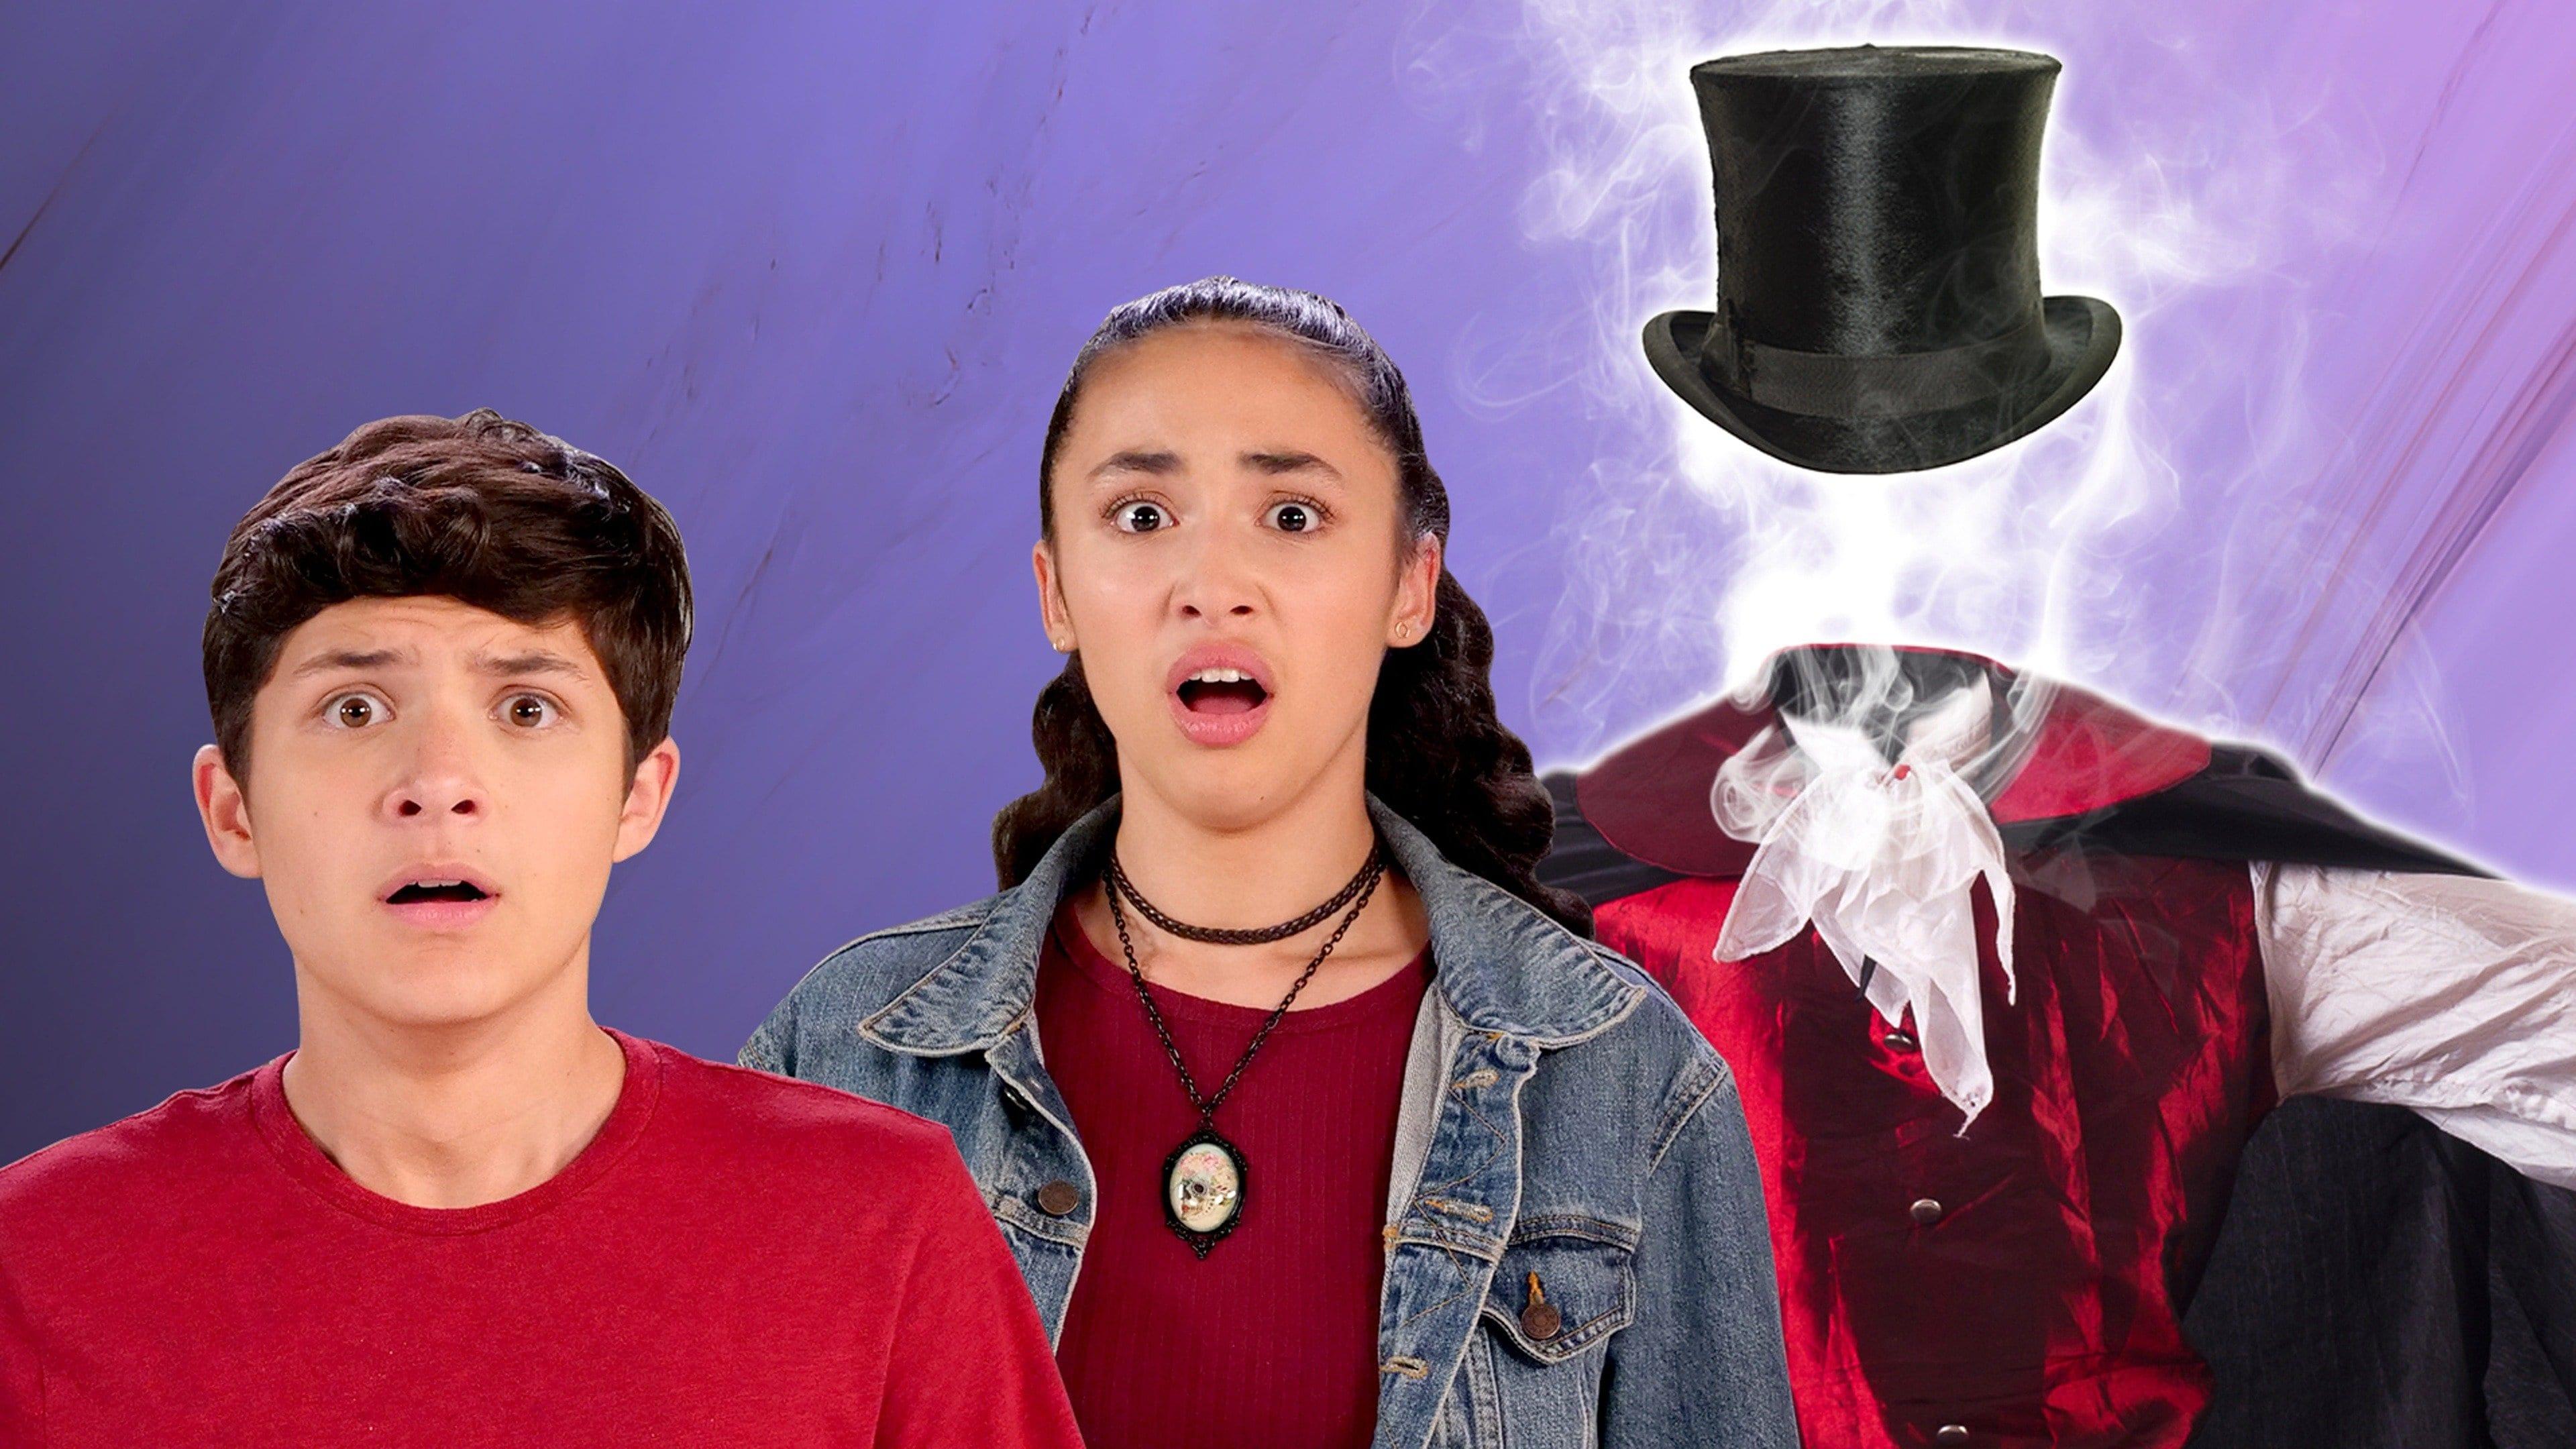 The Headless Magician Attack Akira and Walker!